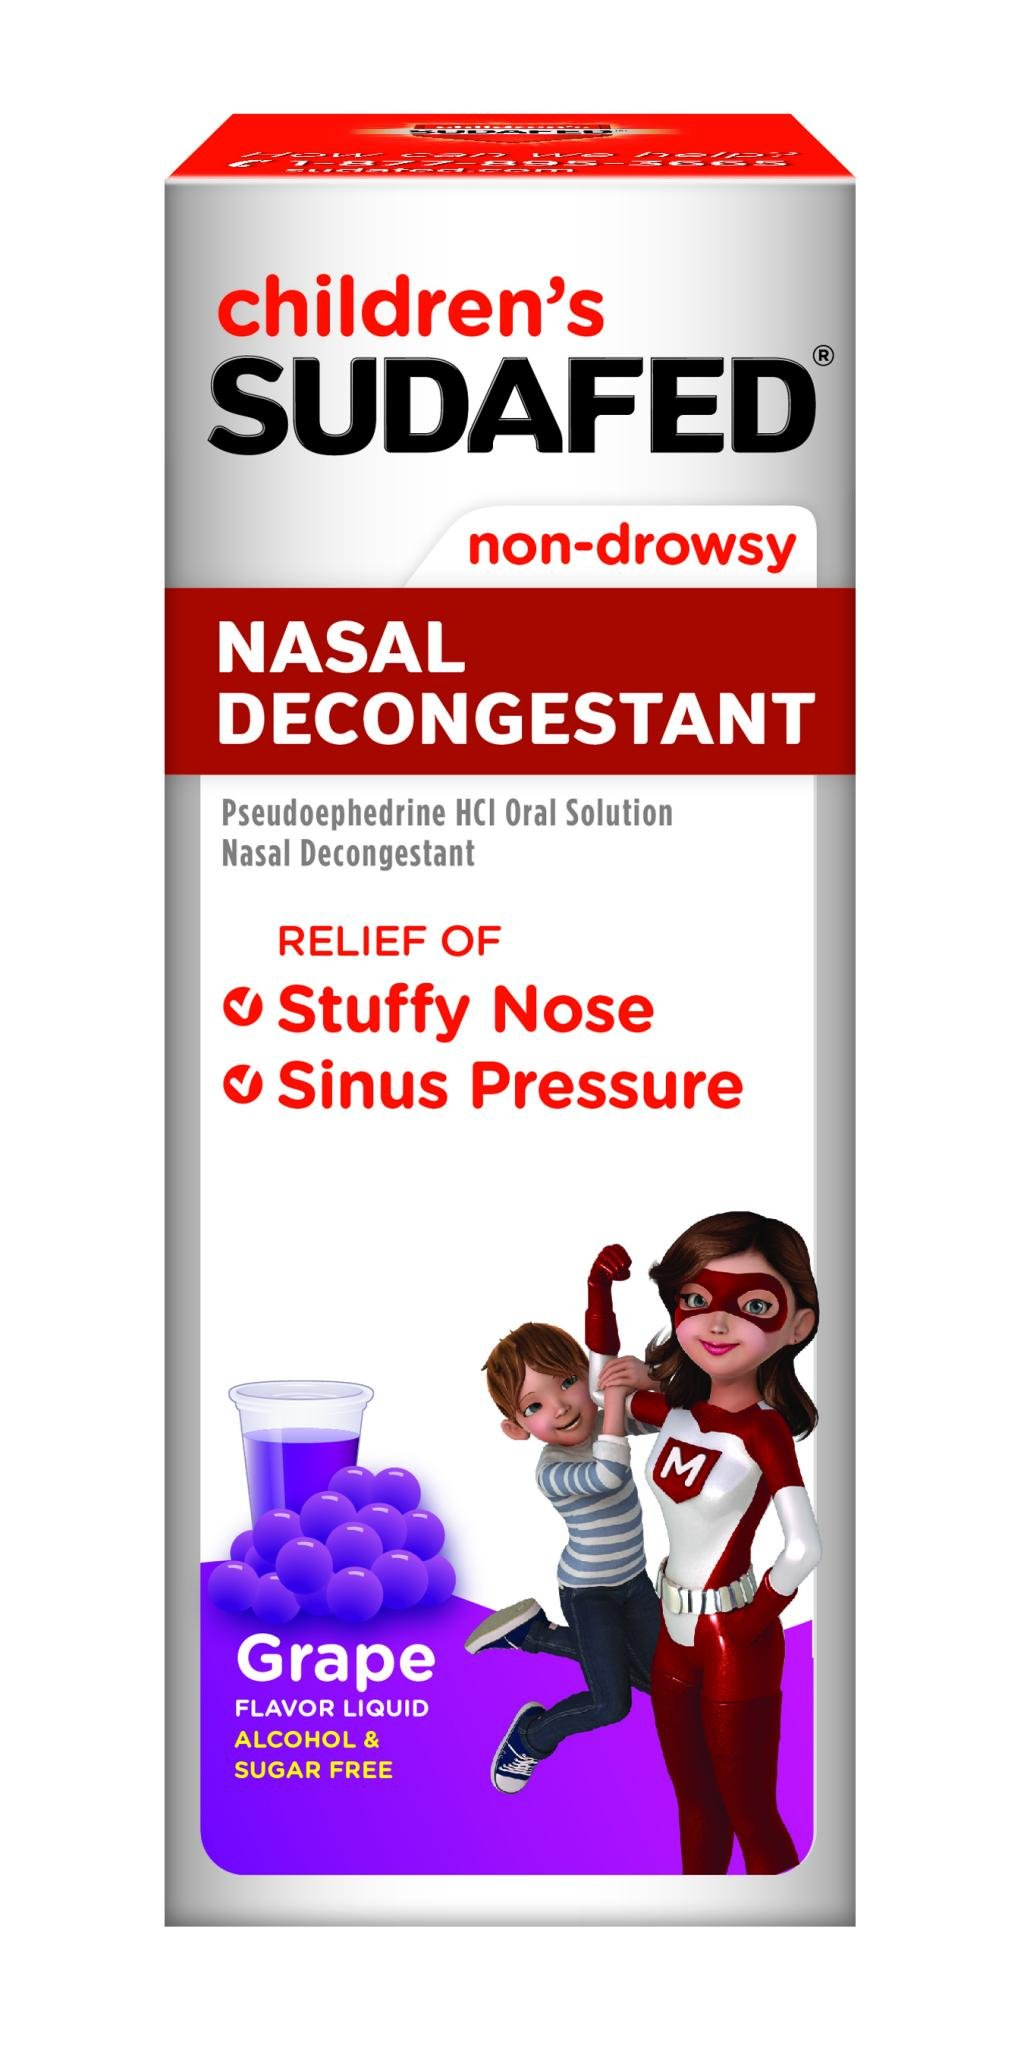 CHILDREN'S SUDAFED® NASAL DECONGESTANT | SUDAFED®